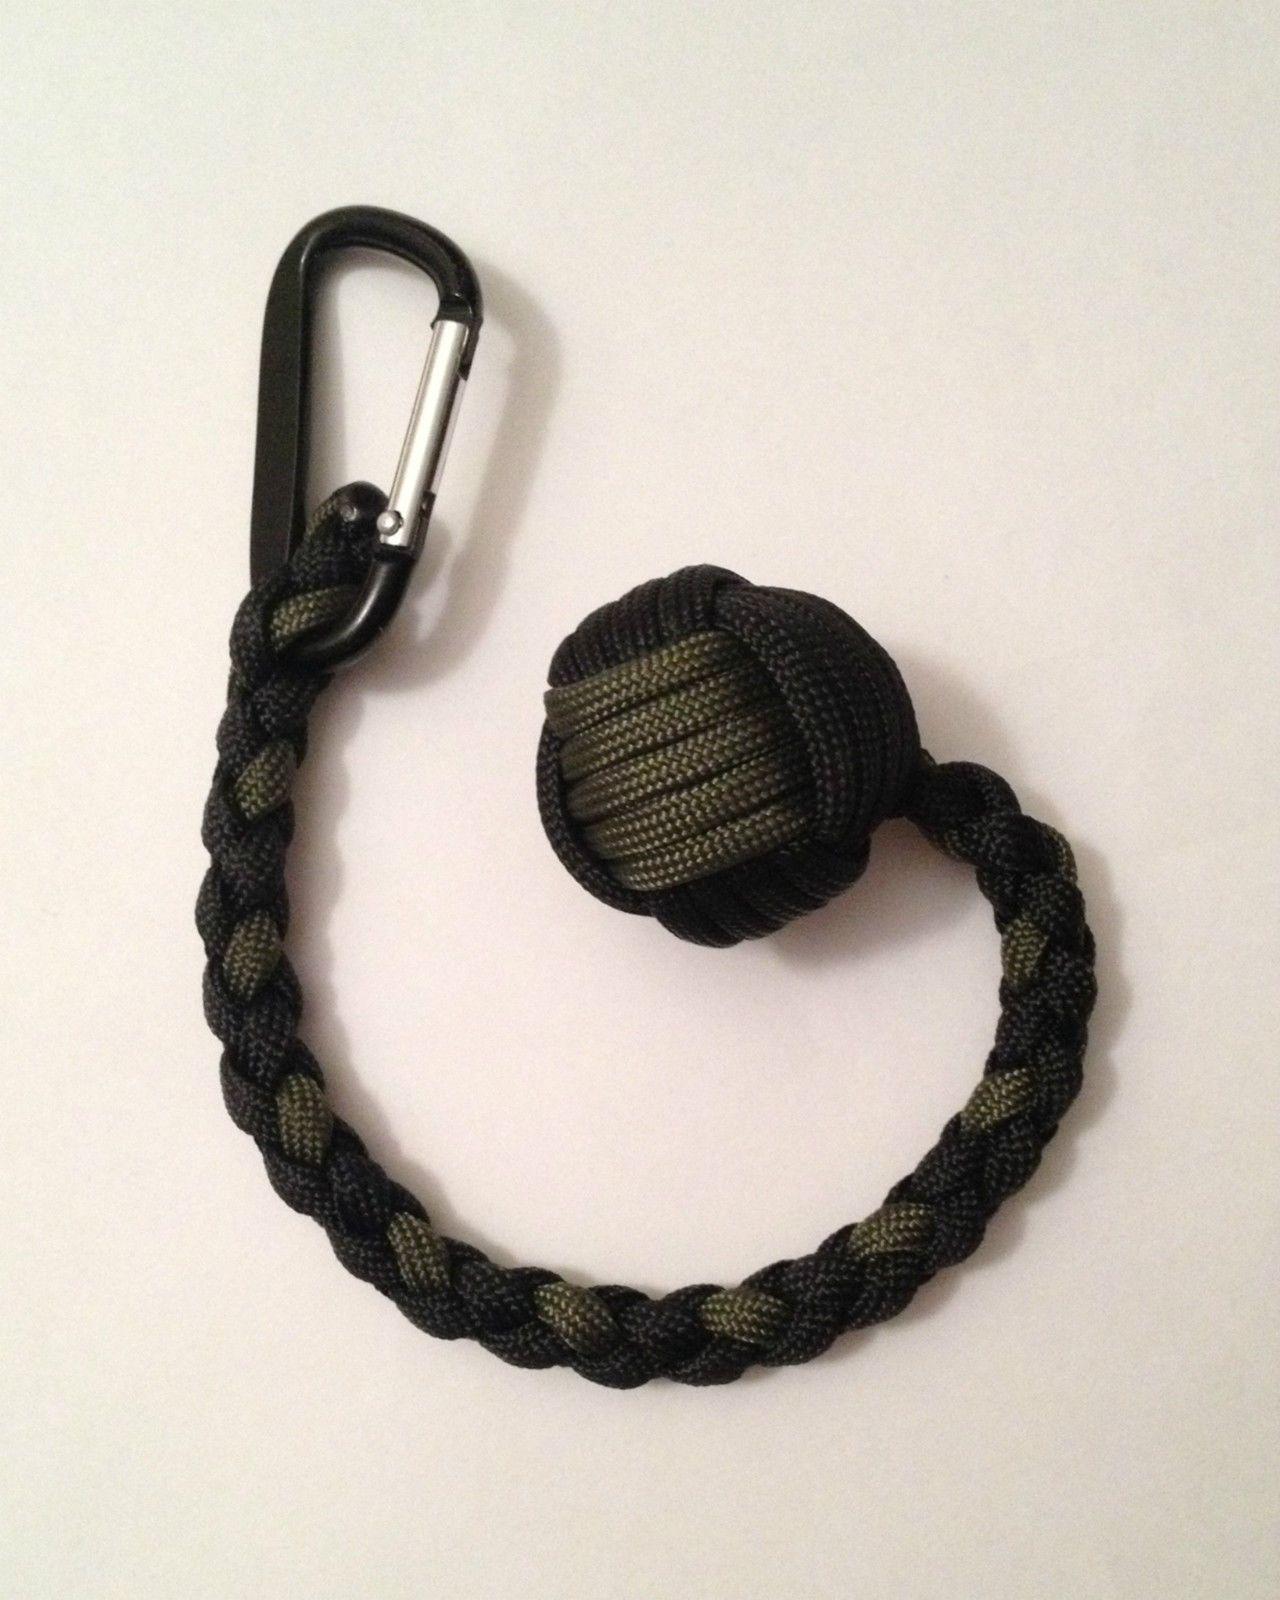 Free Shipping Monkey Fist keychain 1